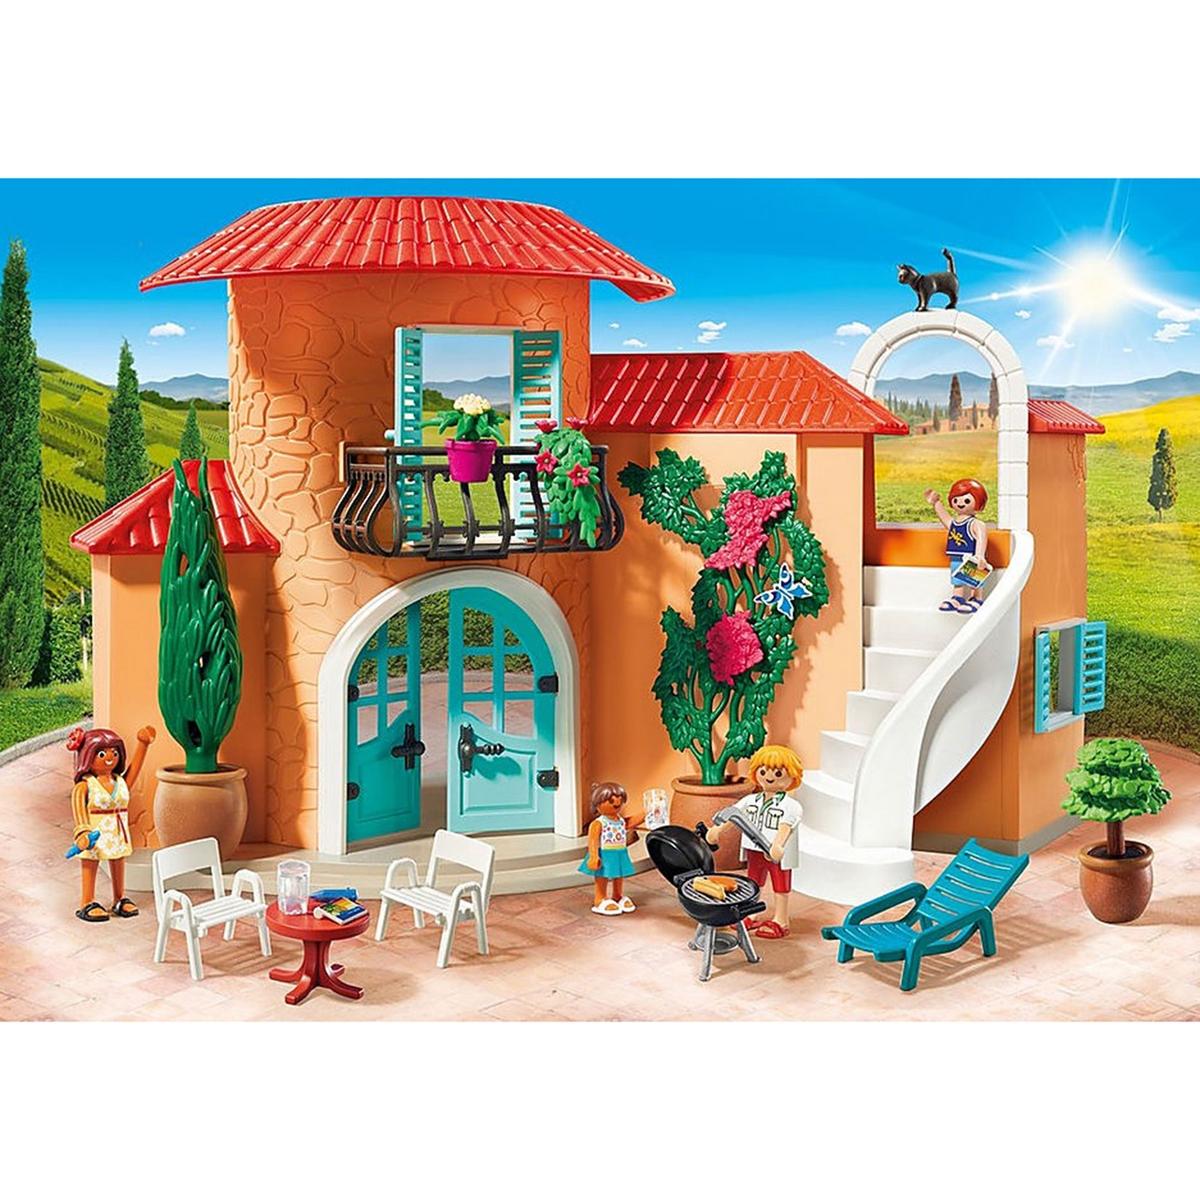 An image of Playmobil Summer Villa